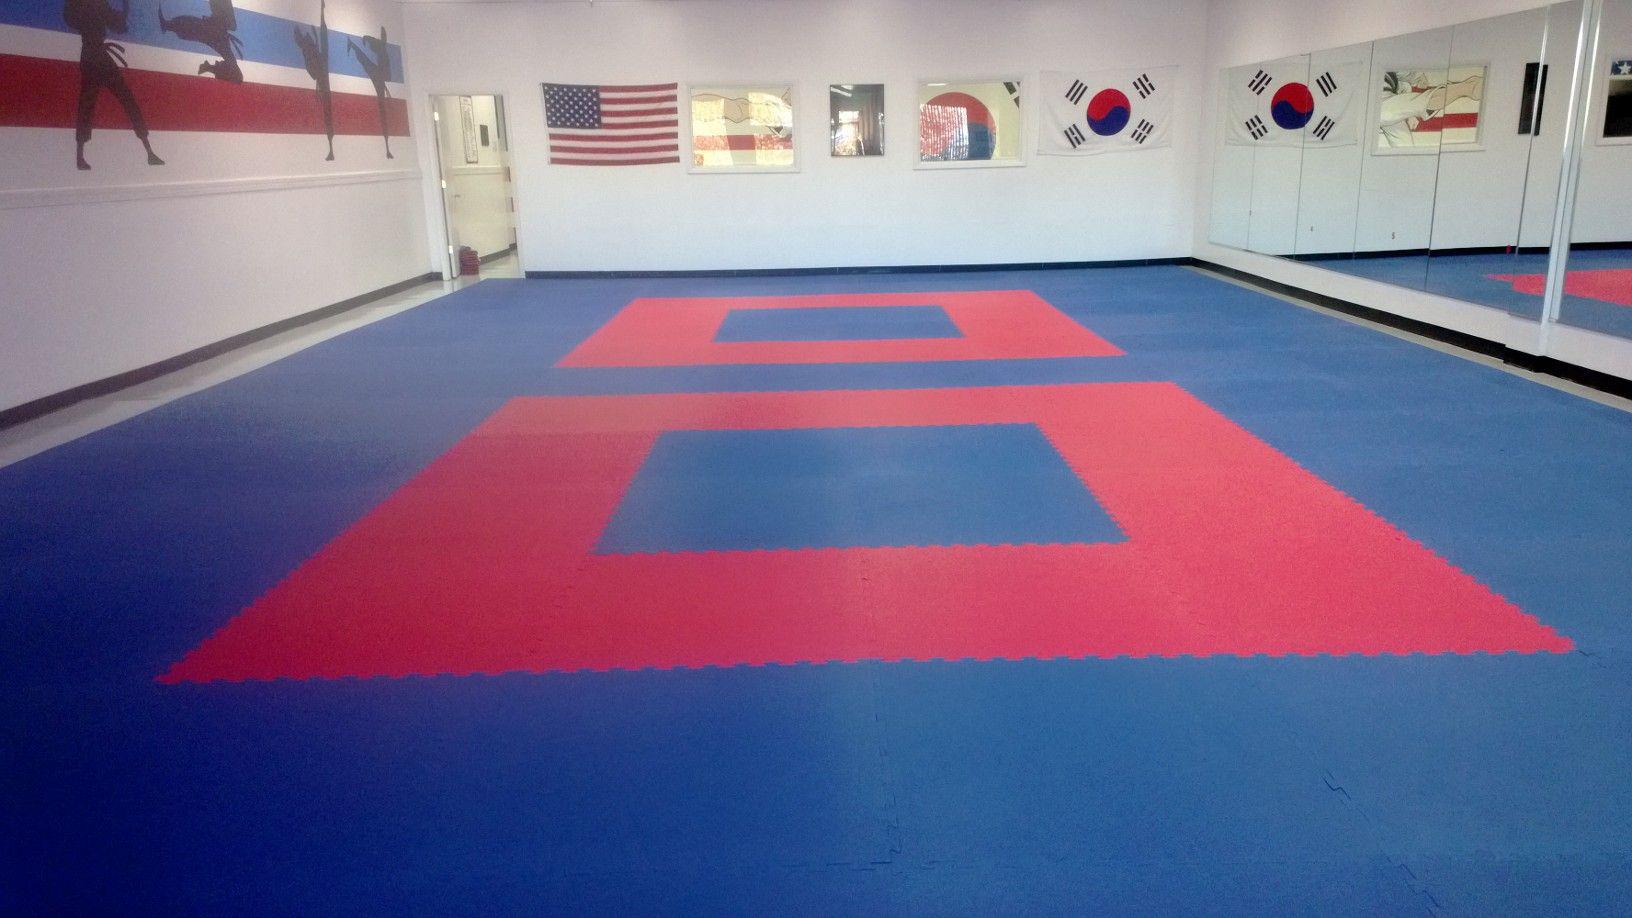 Martial Arts Karate Mat Premium 1 Inch In 2020 Karate Mats Taekwondo Floor Martial Arts Mats